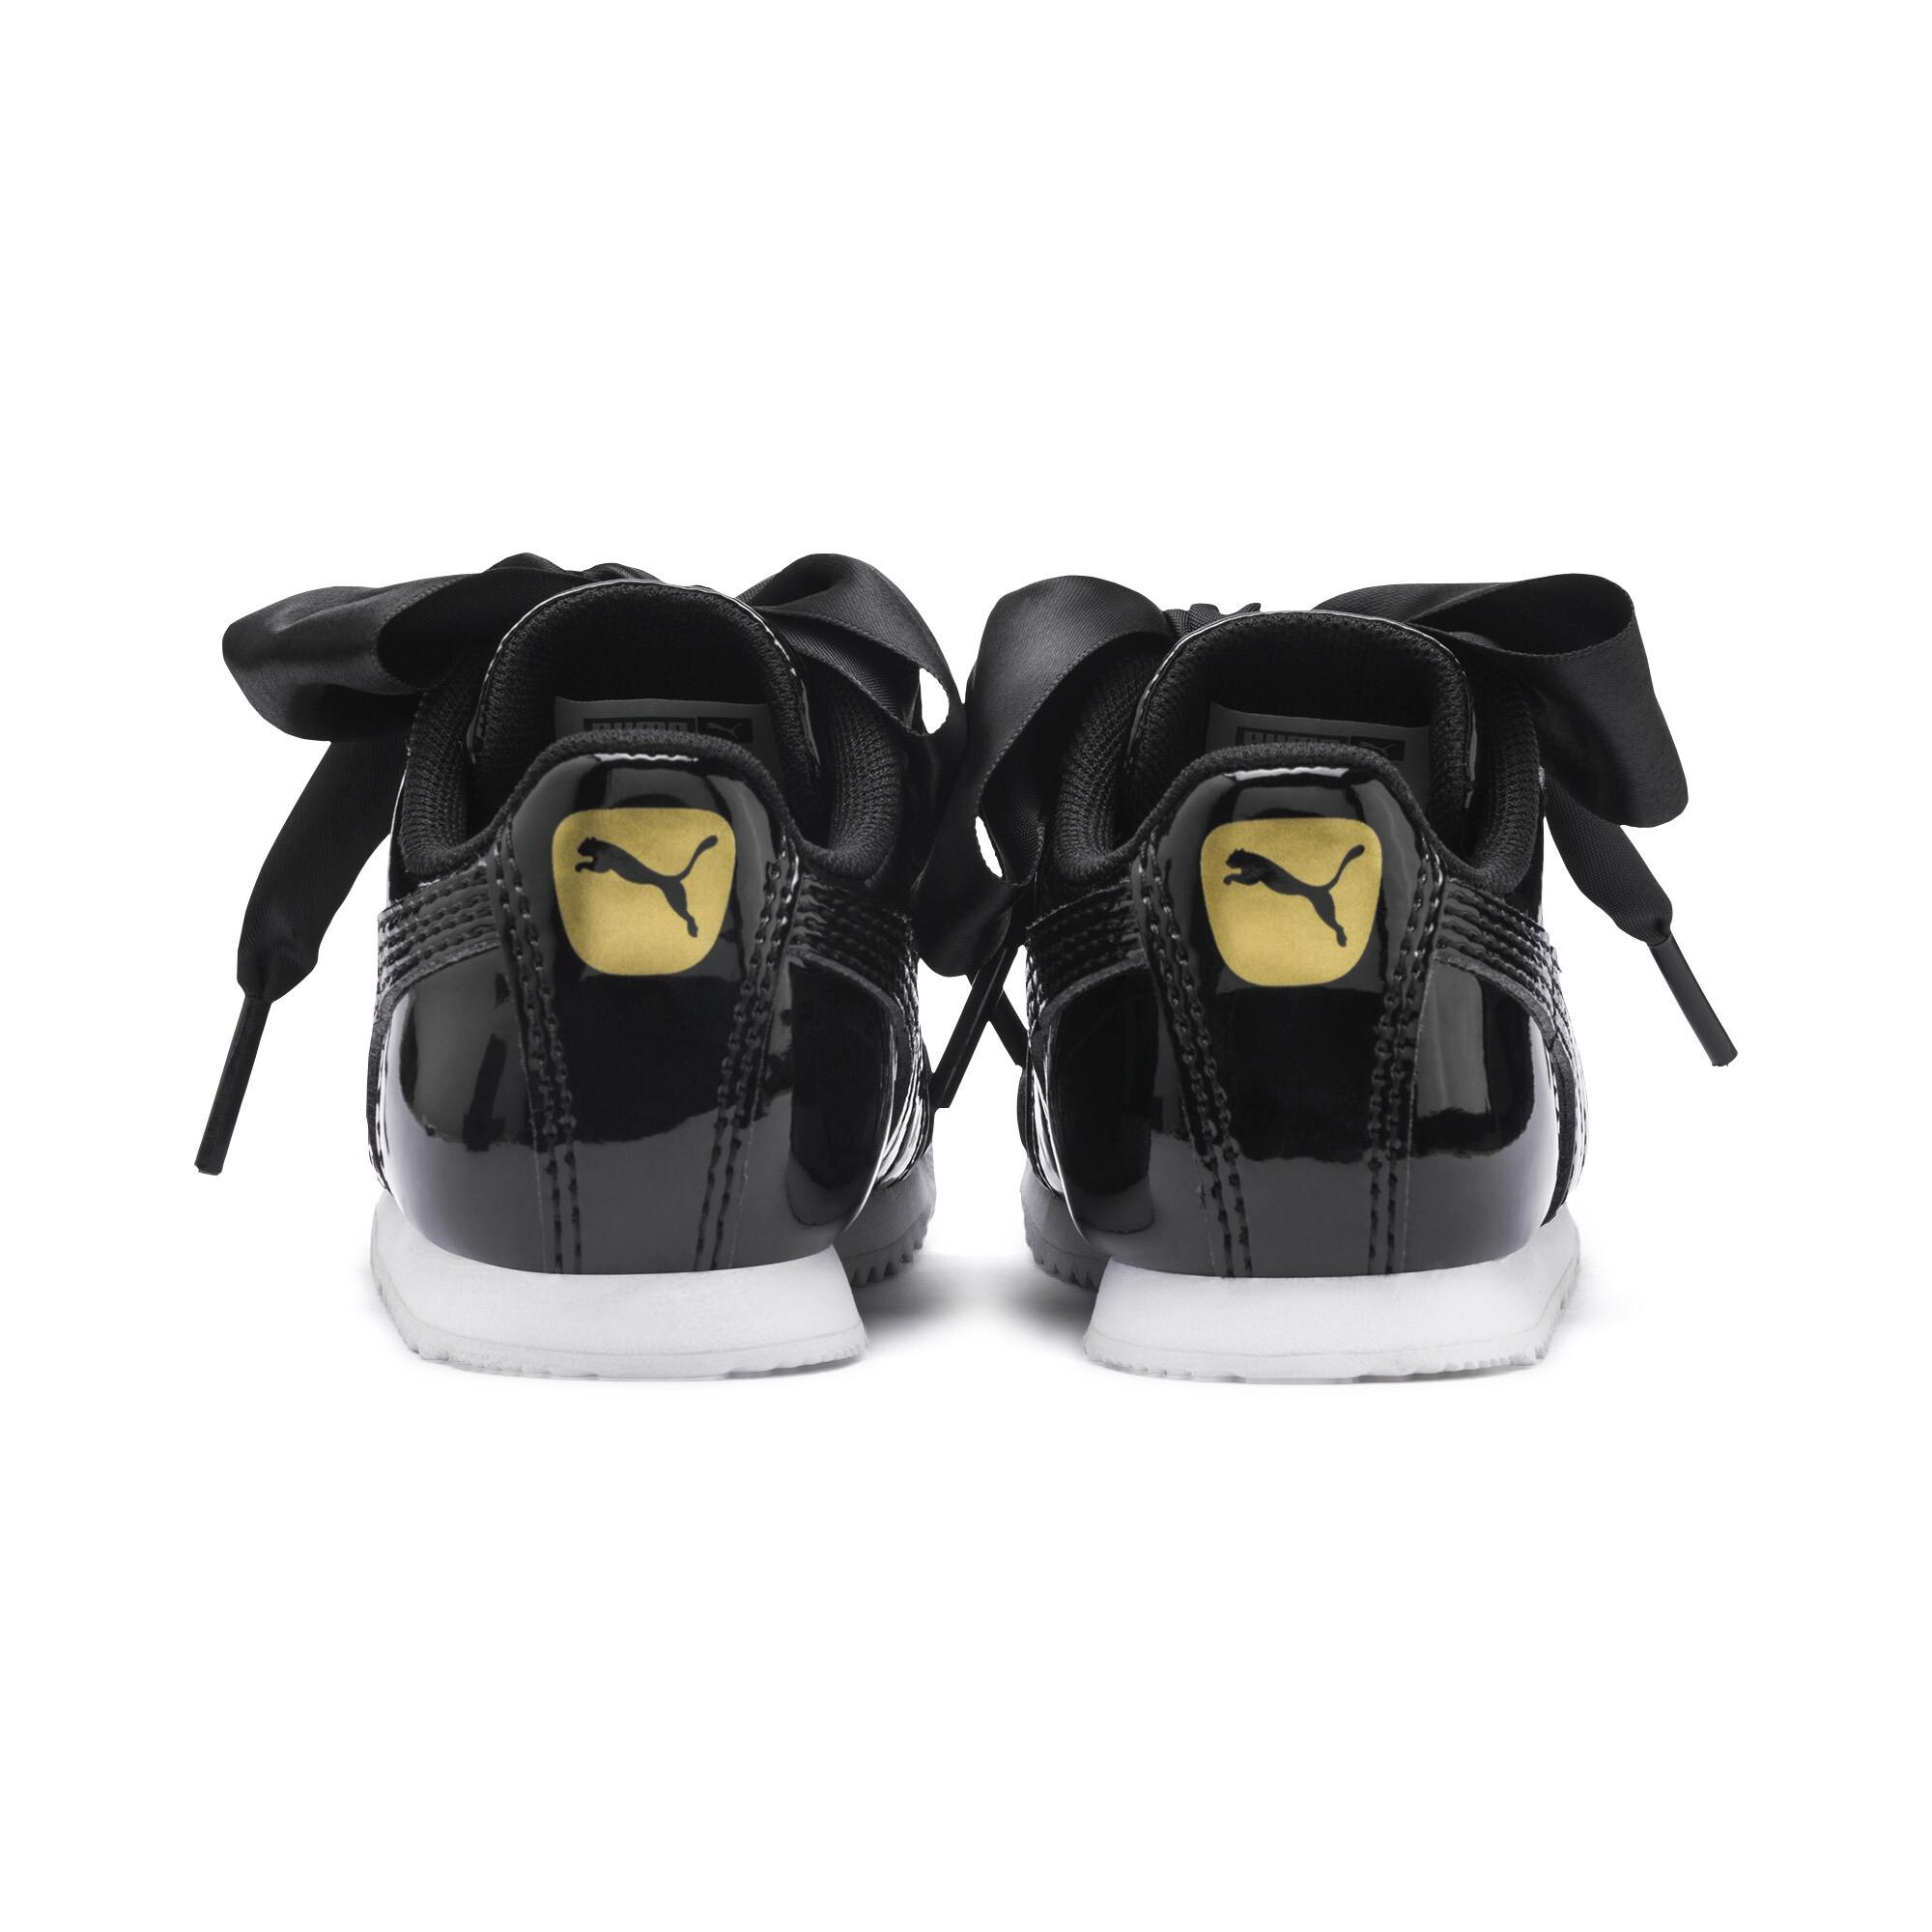 PUMA-Roma-Heart-Patent-Toddler-Shoes-Girls-Shoe-Kids thumbnail 3